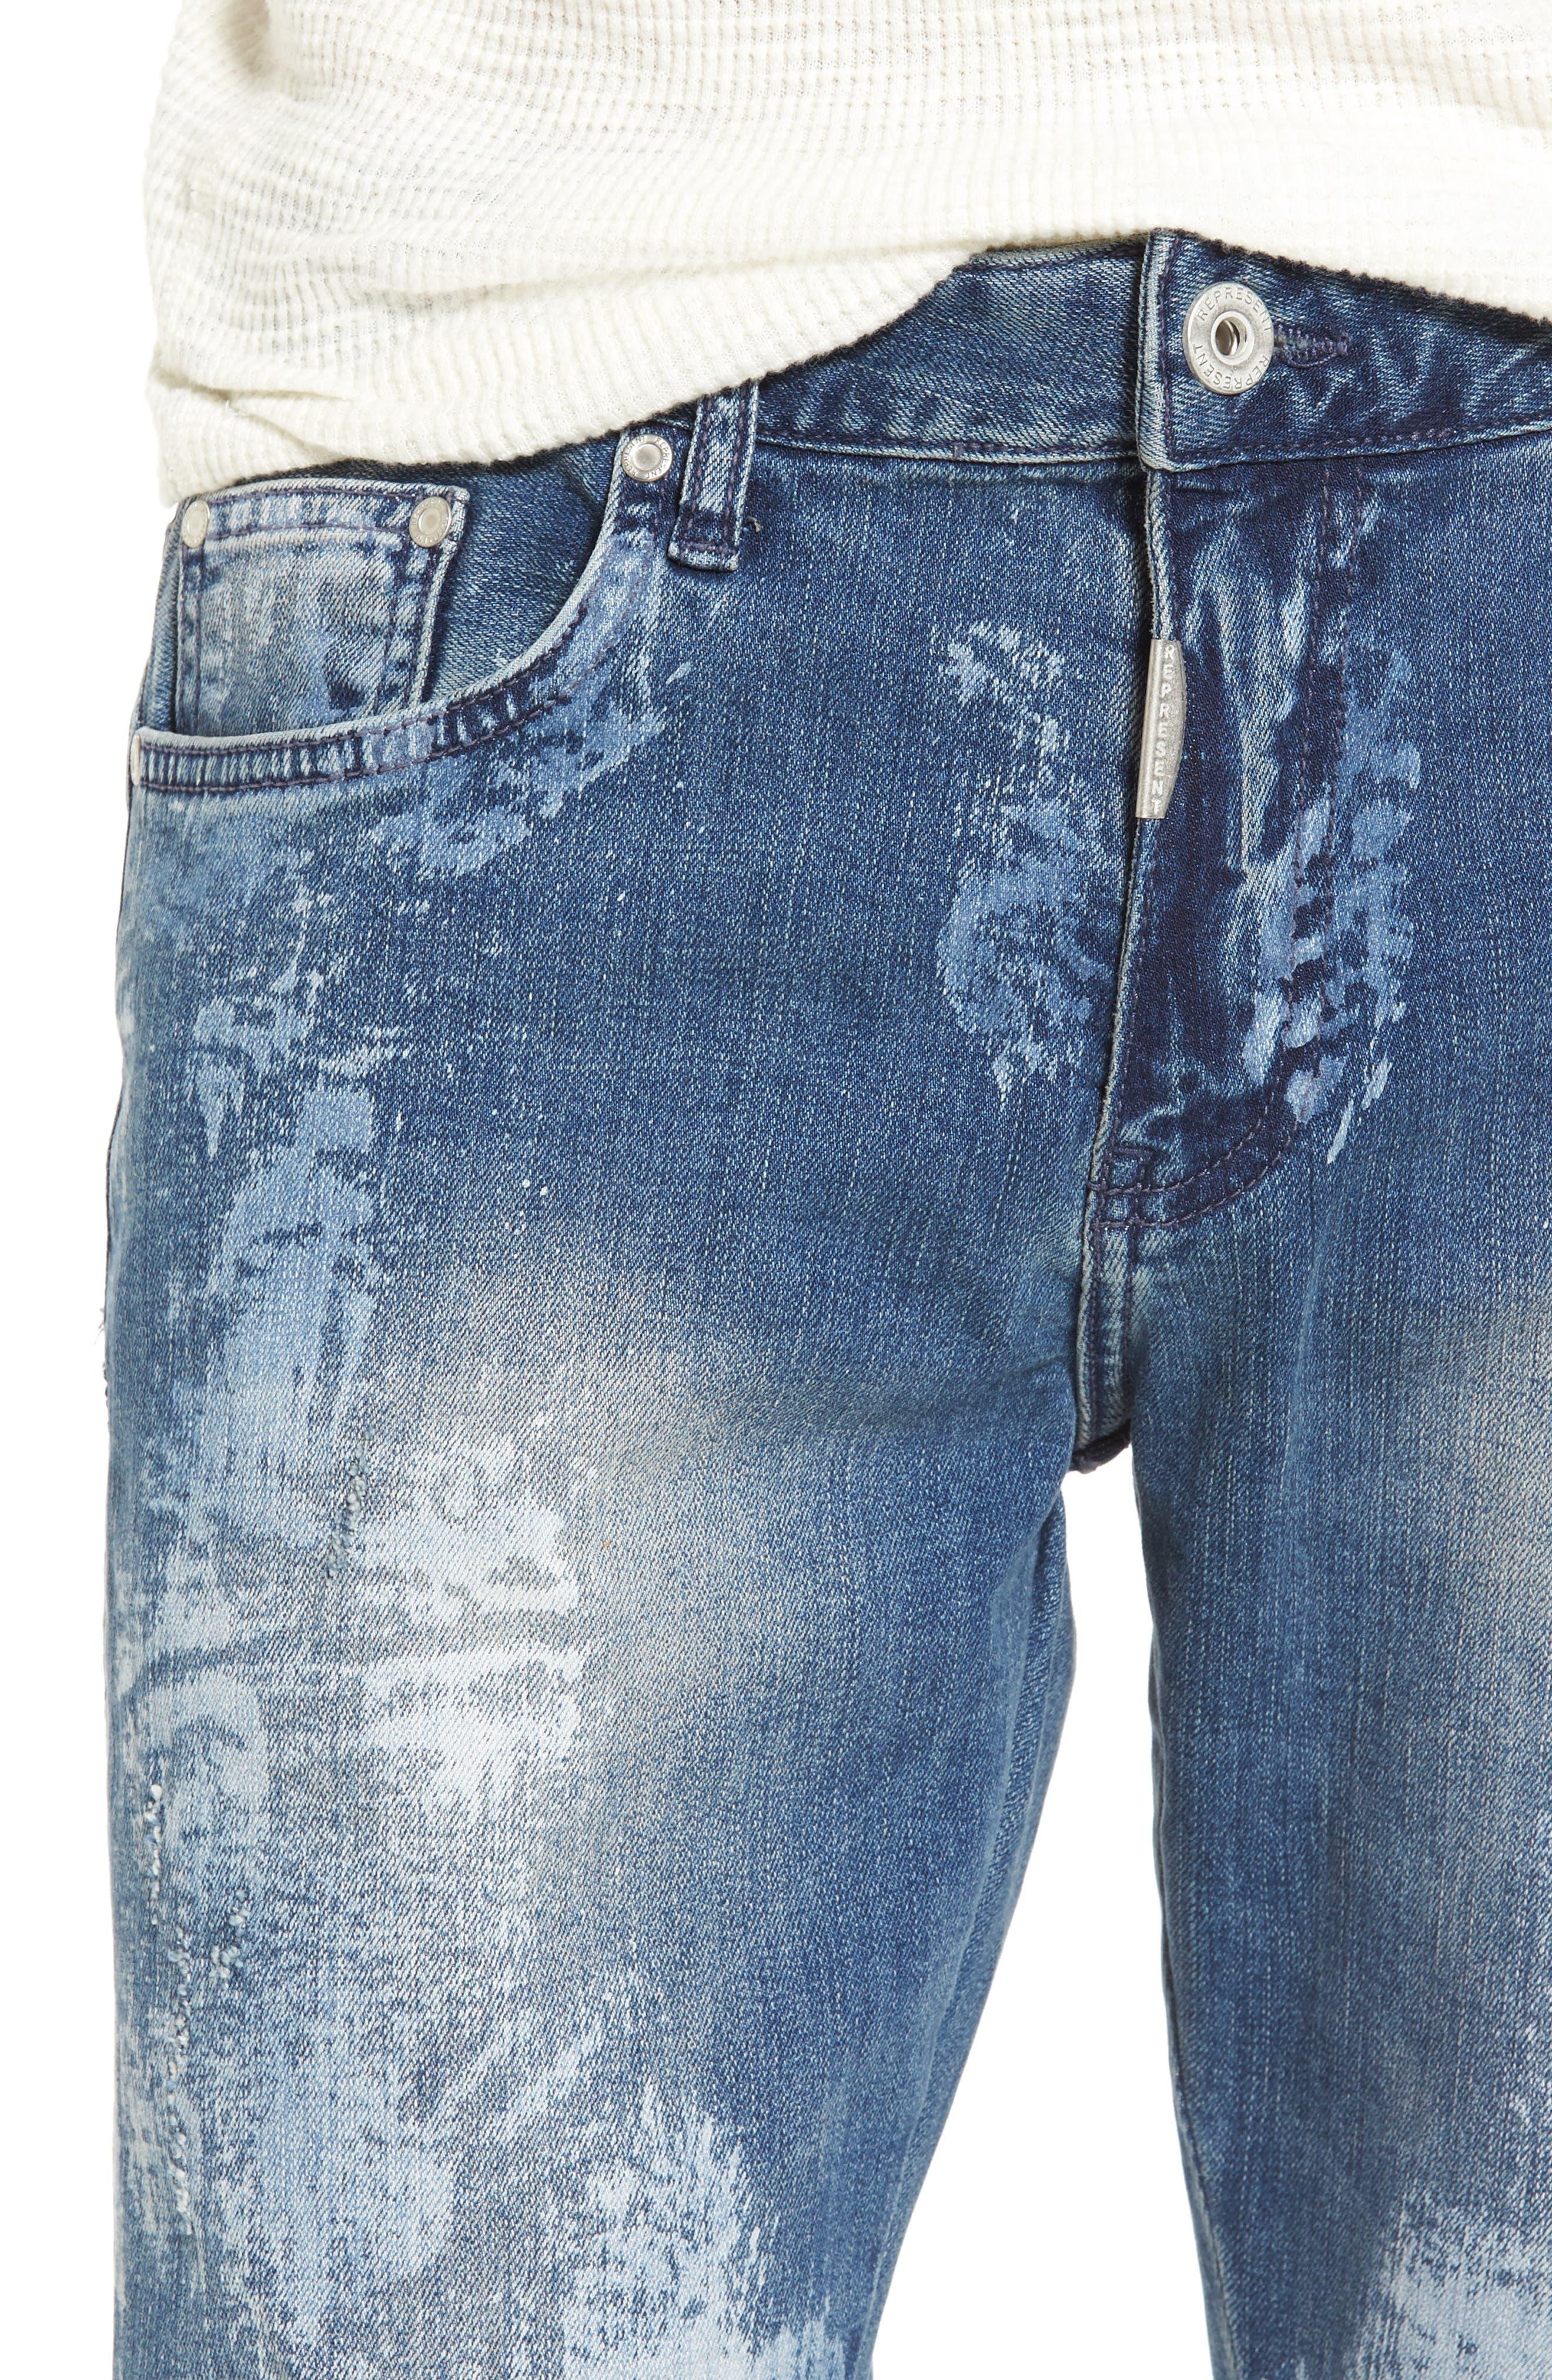 Slim Fit Destroyed Jeans,                             Alternate thumbnail 4, color,                             Heavy Bleach